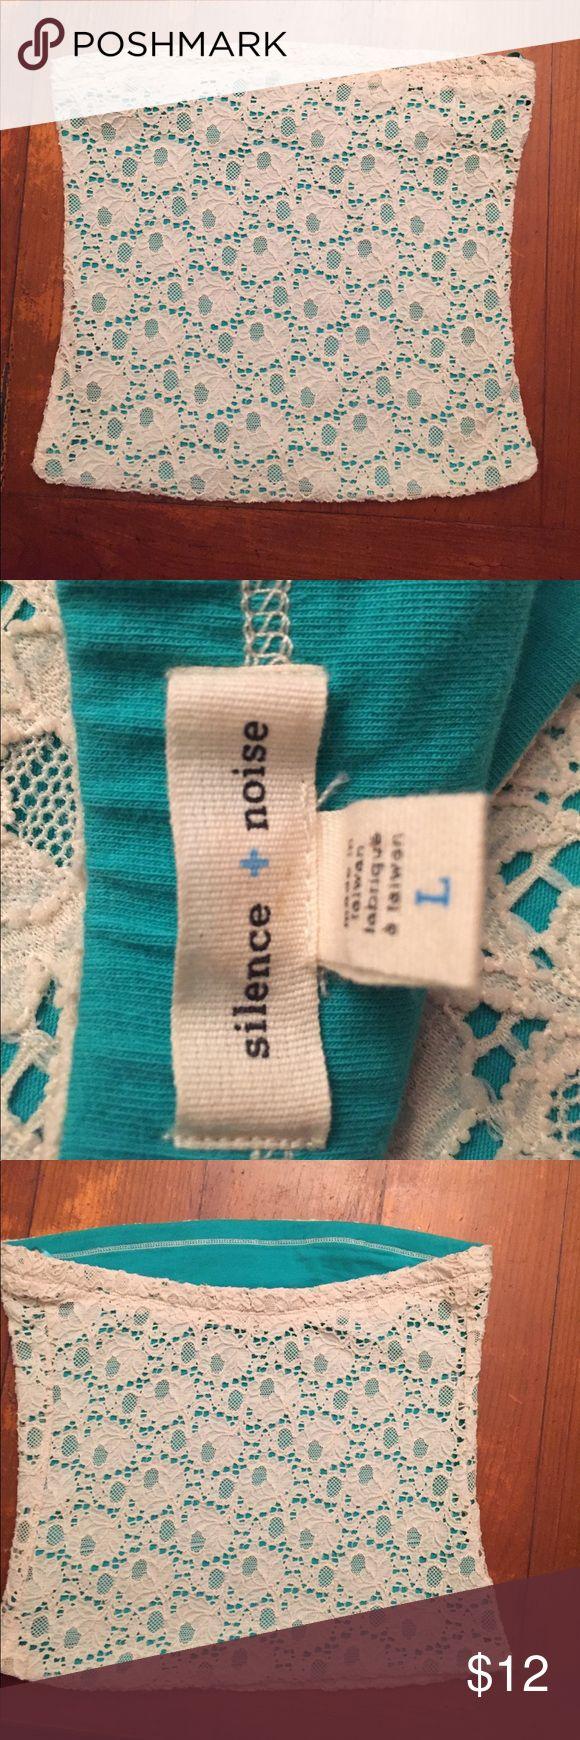 Super Cute Boho Lace Crochet Tube Top by UO Super Cute Boho Lace Crochet Tube Top by UO silence + noise Tops